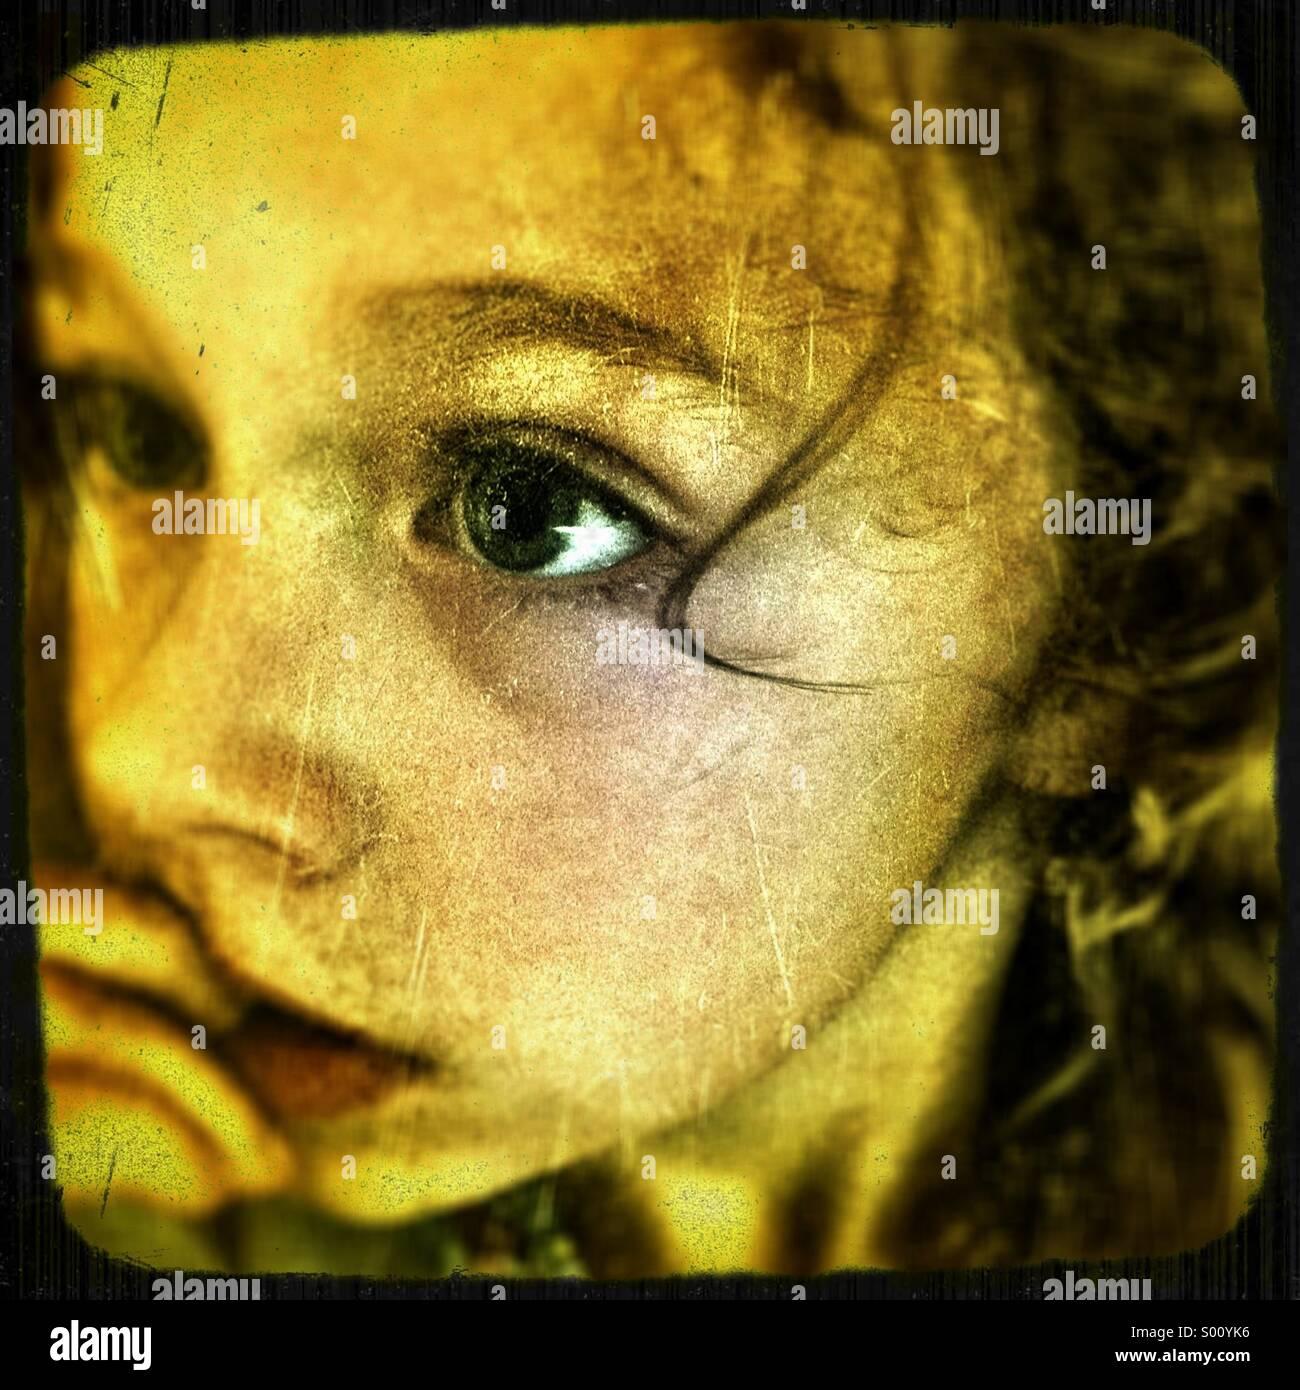 Girls face - Stock Image